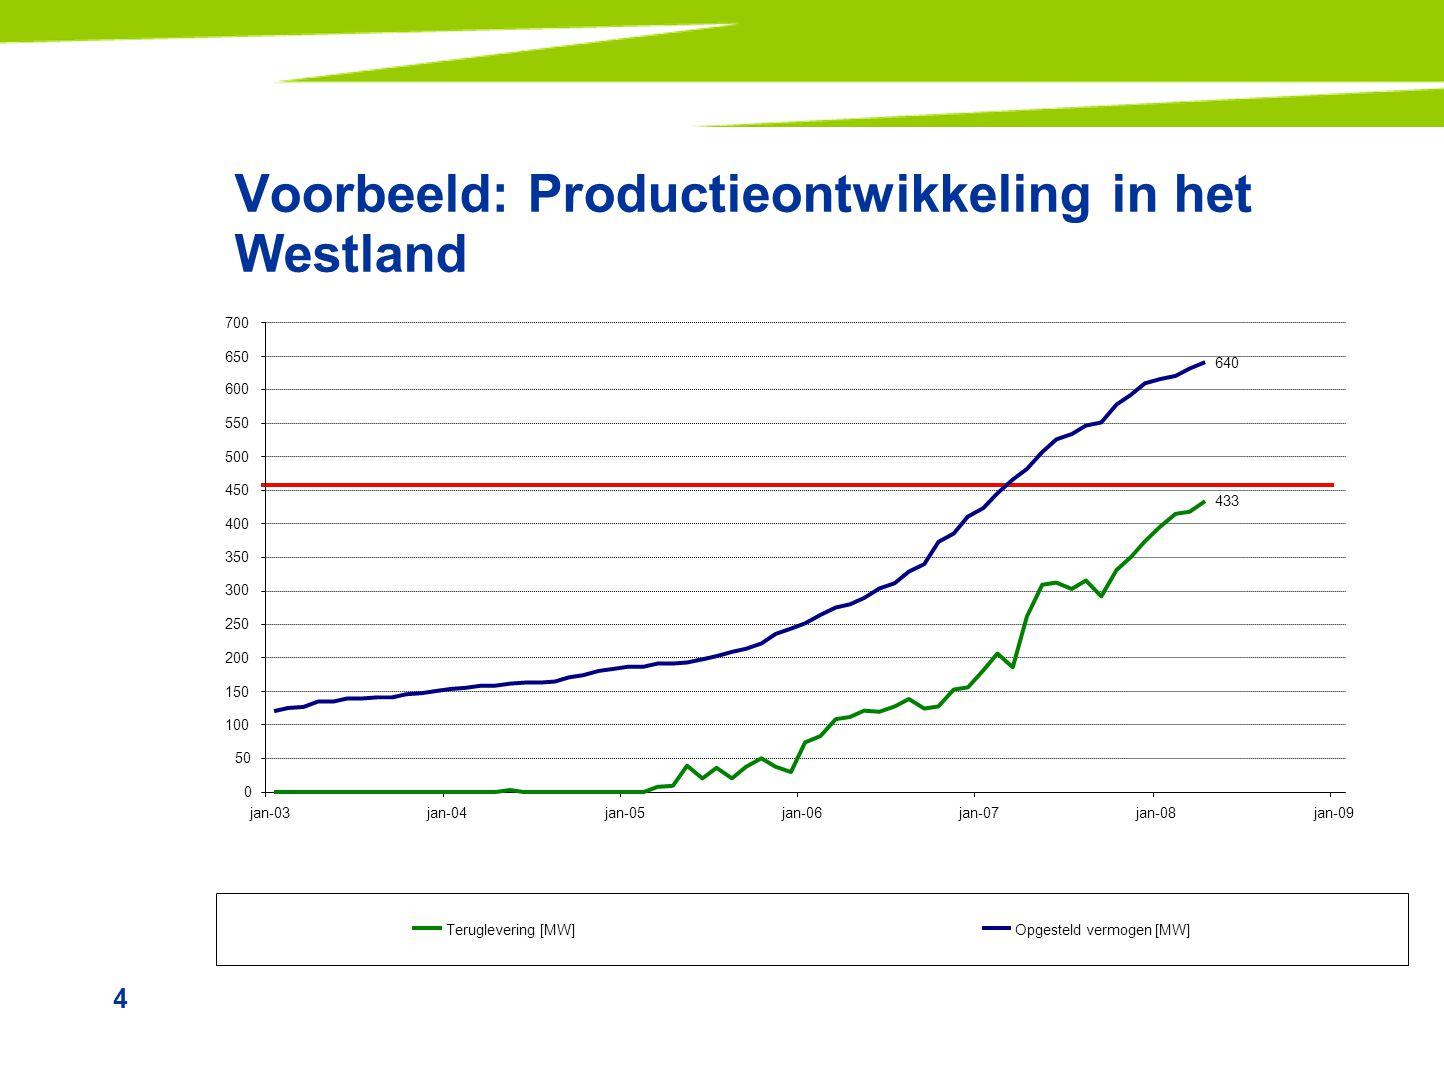 4 Voorbeeld: Productieontwikkeling in het Westland 433 640 0 50 100 150 200 250 300 350 400 450 500 550 600 650 700 jan-03jan-04jan-05jan-06jan-07jan-